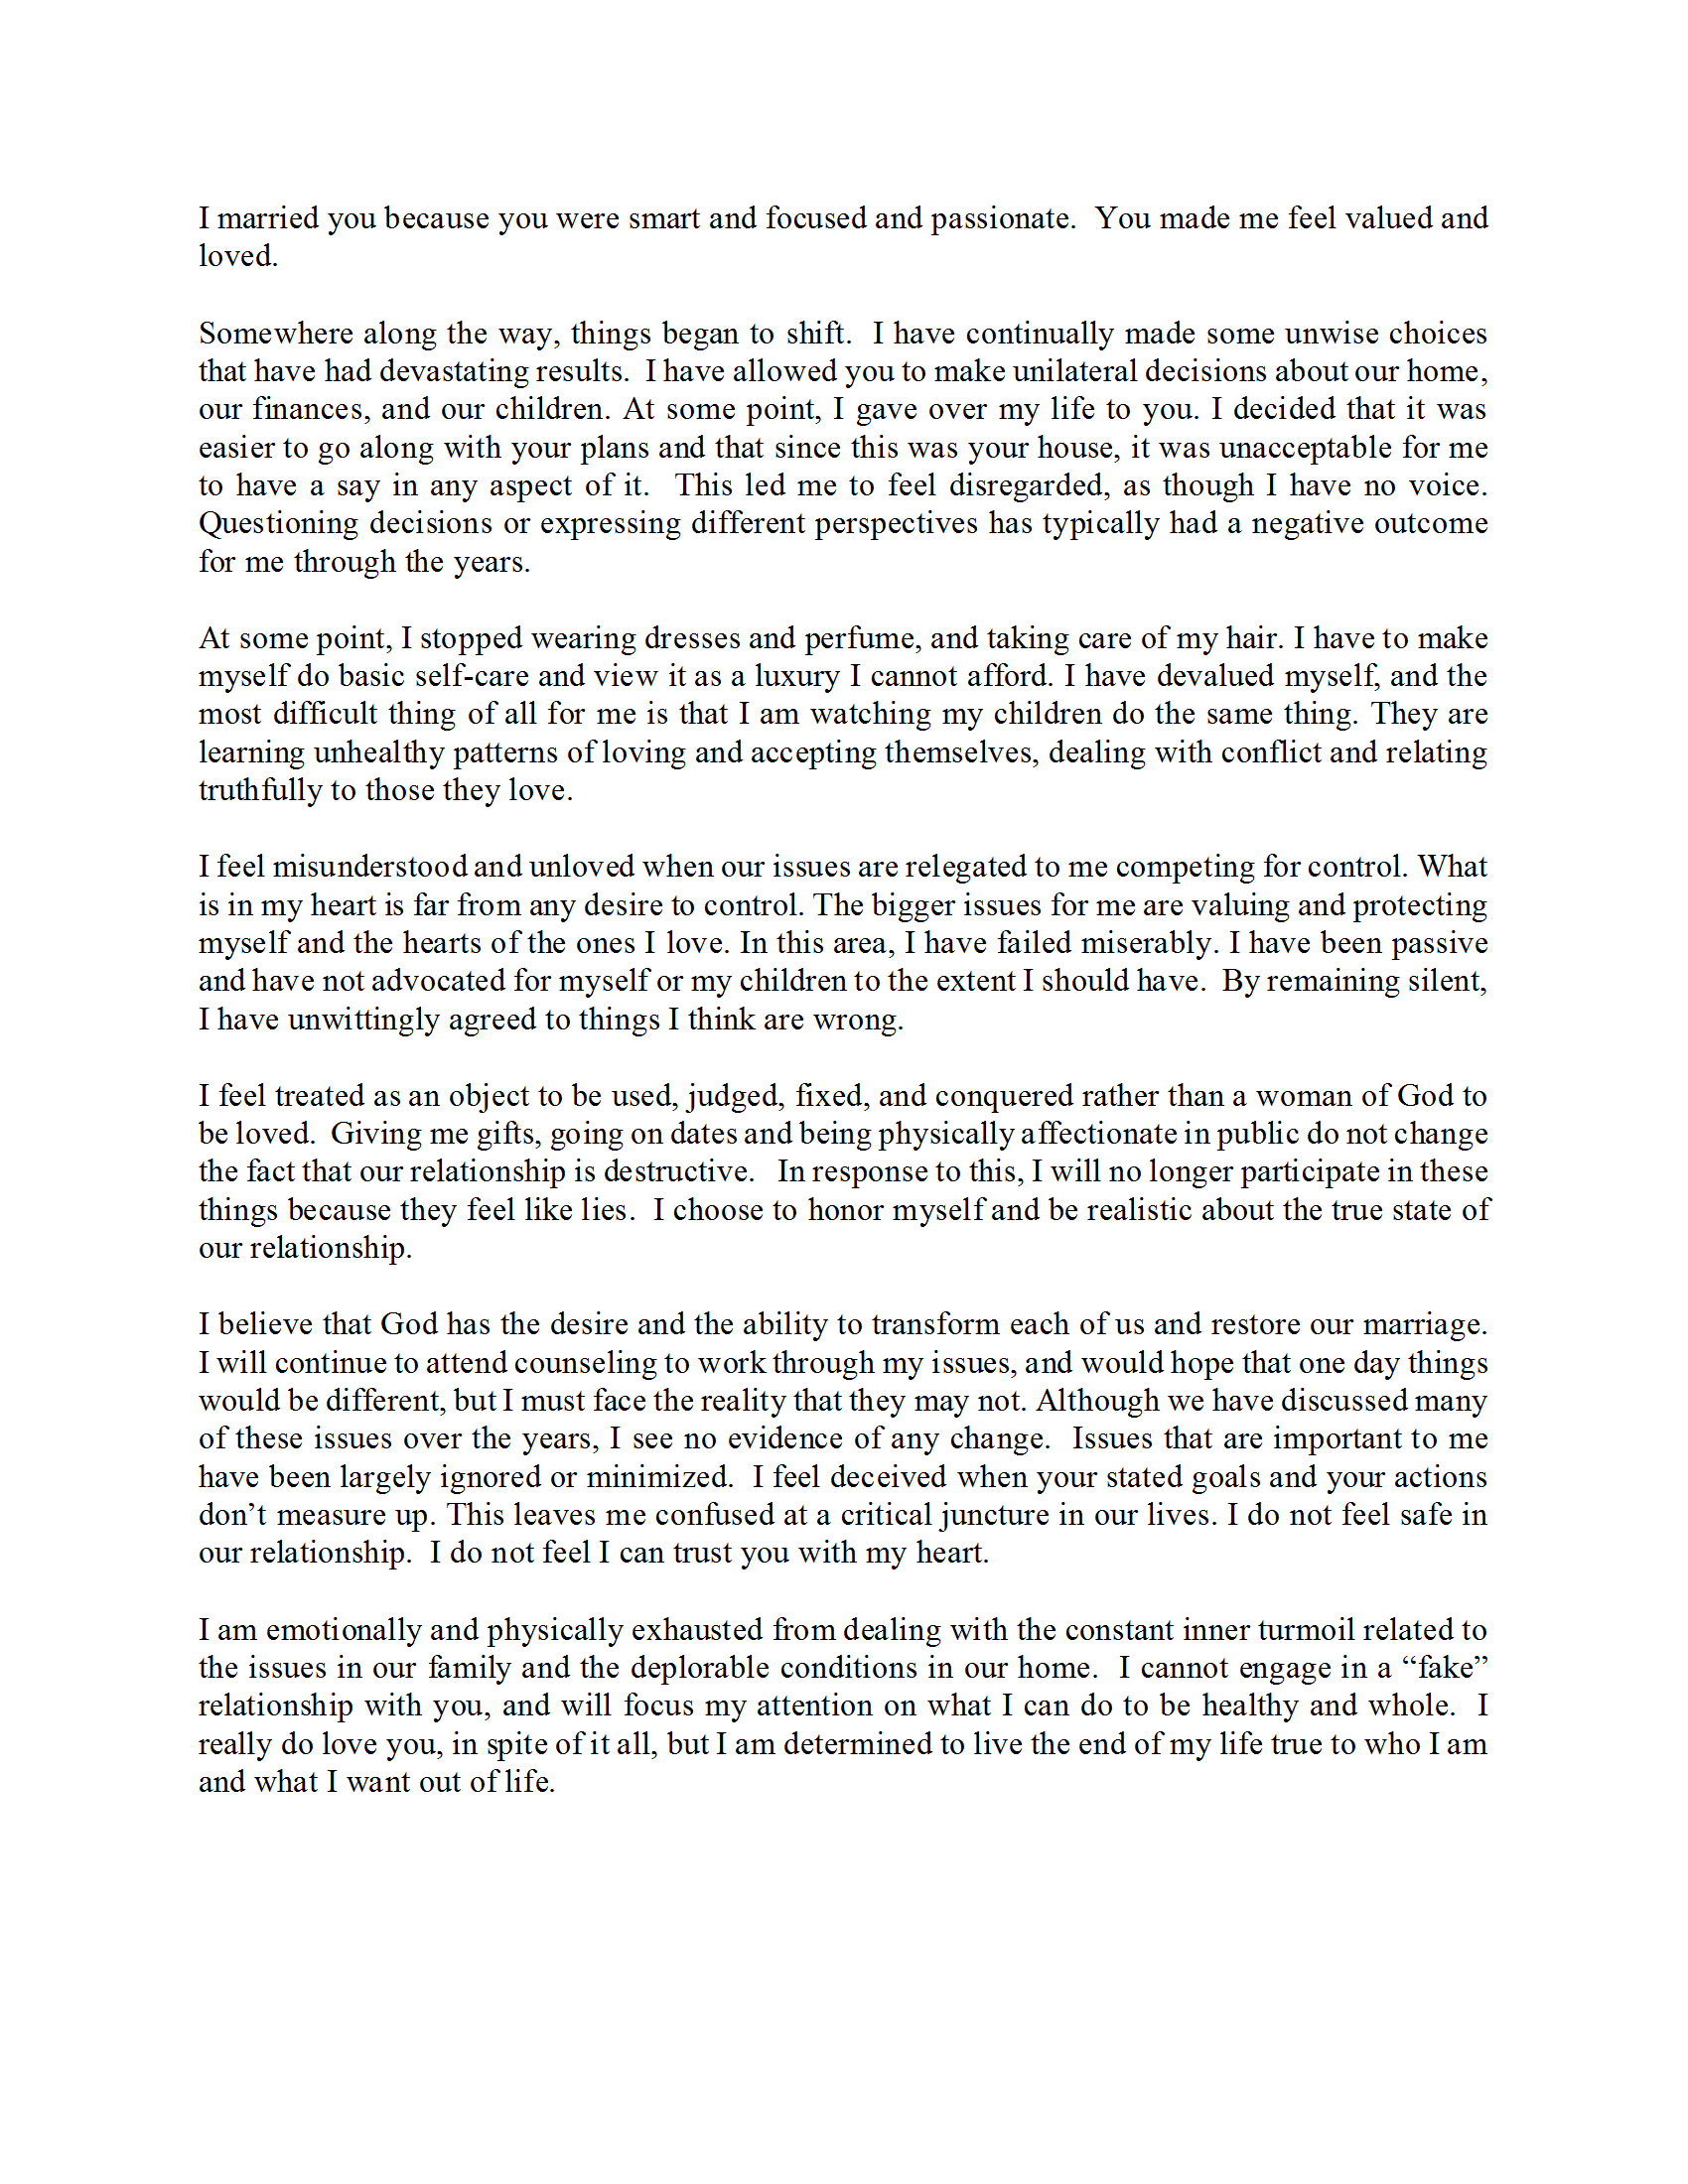 Sample Confrontation Letter.docx Conflict resolution